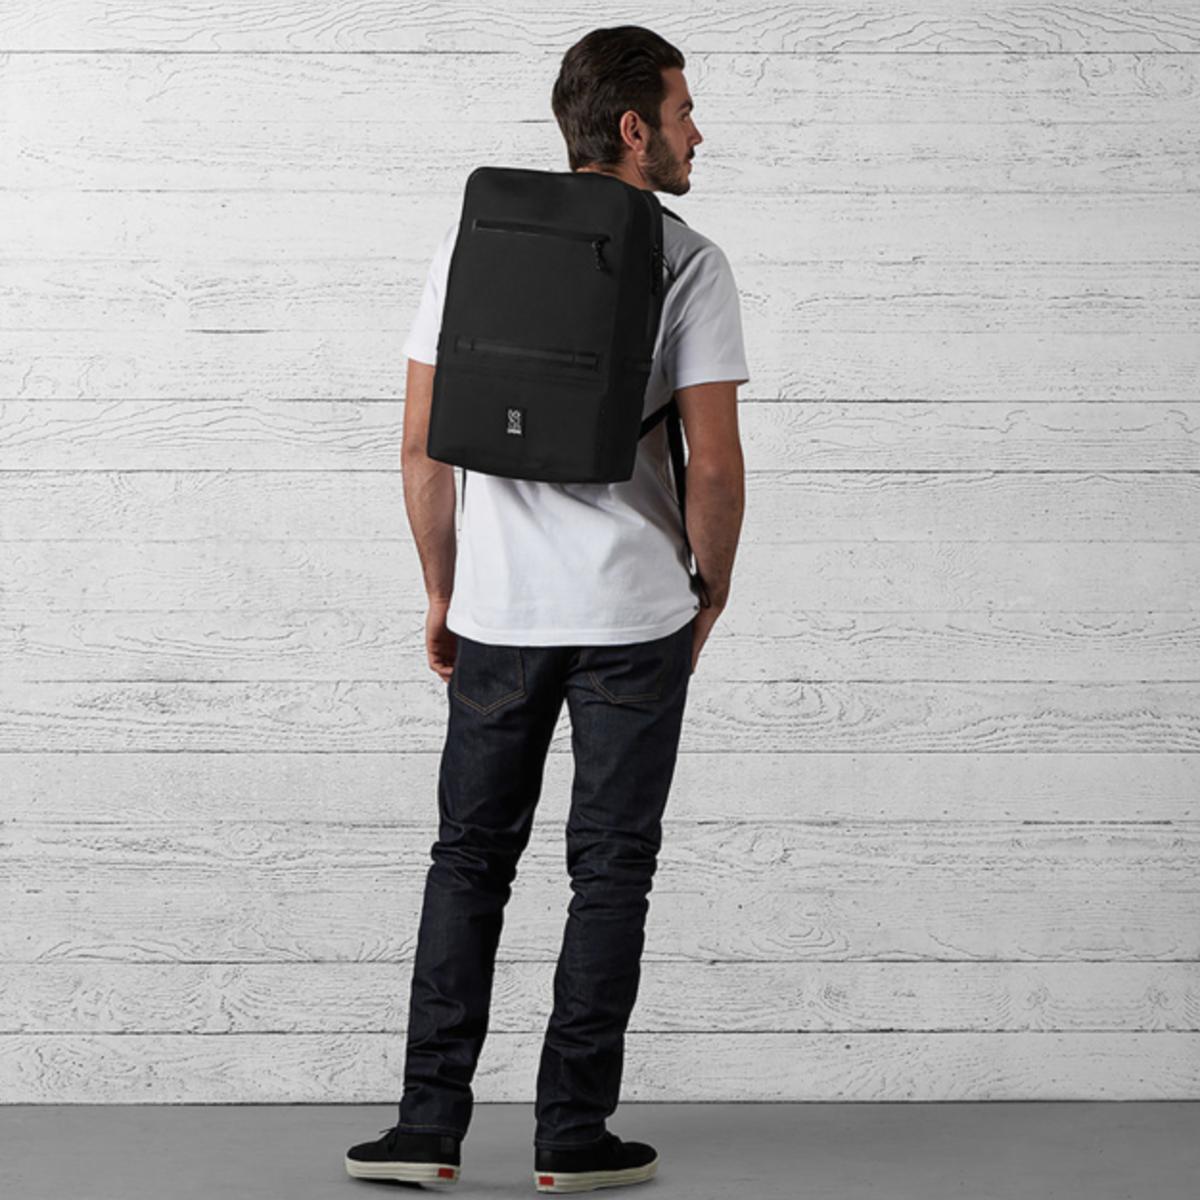 f:id:thebackpack:20190520184417p:plain